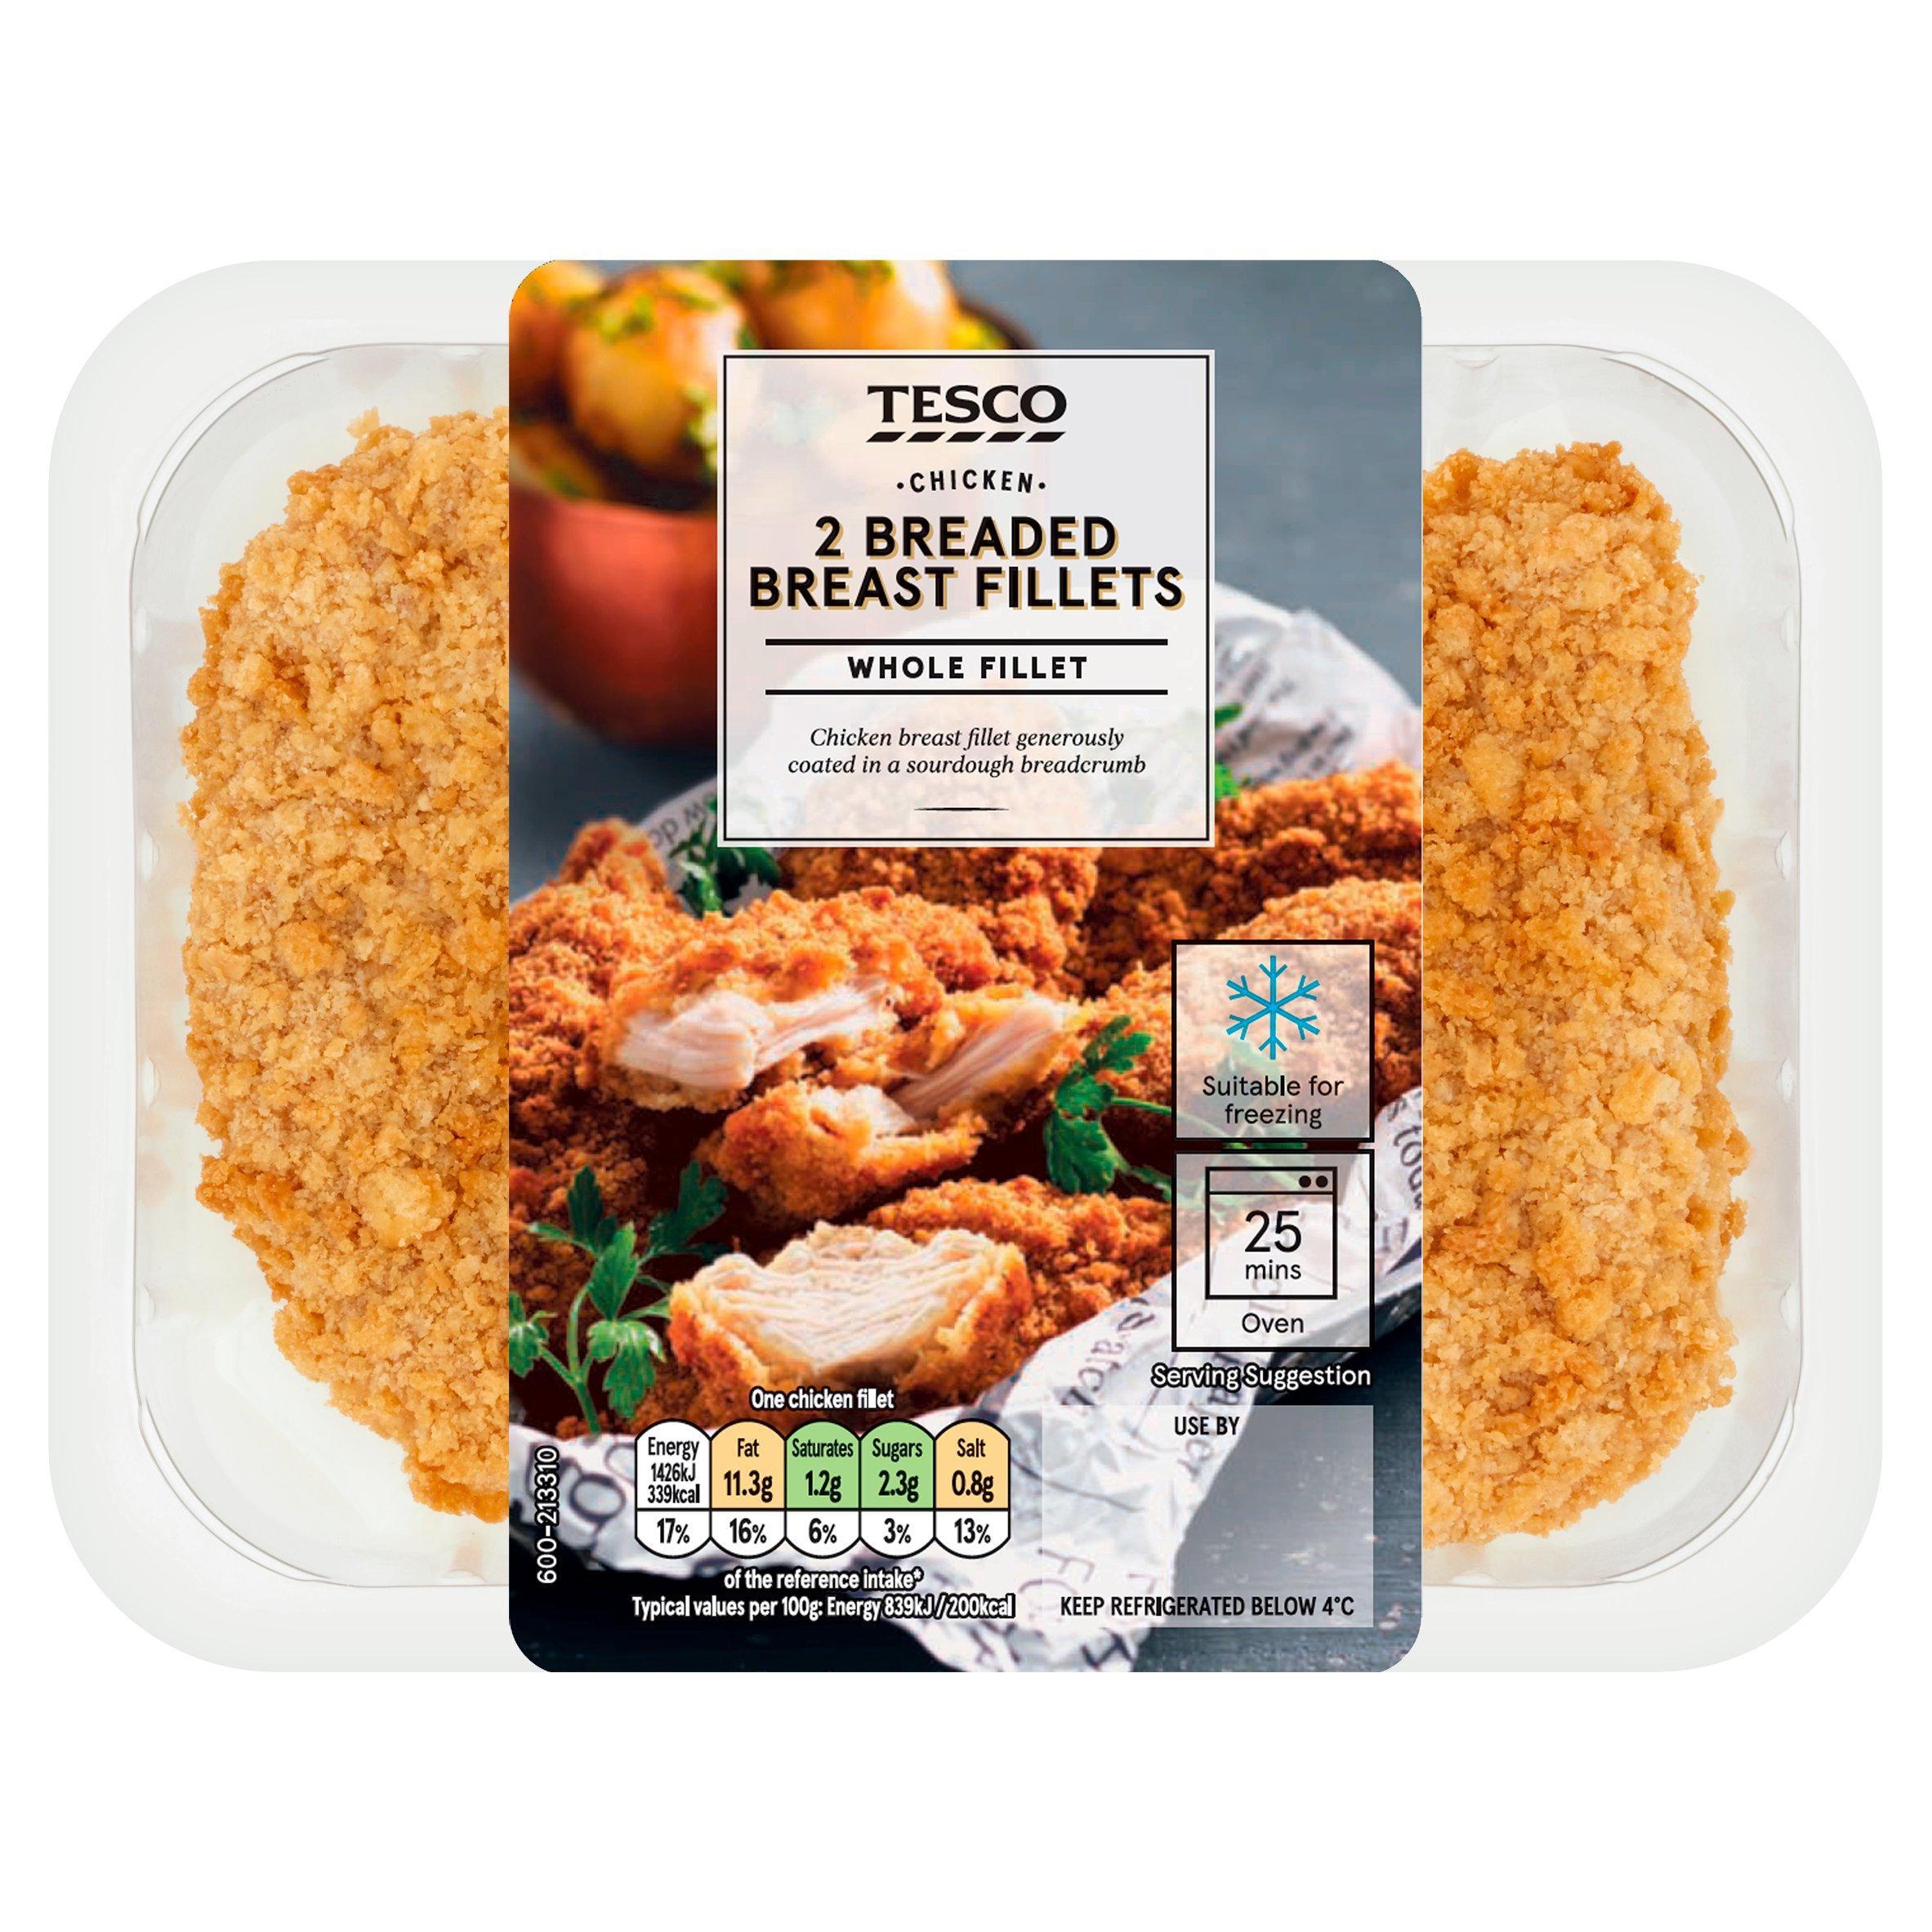 Tesco 2 Breaded Chicken Breast Fillets 350